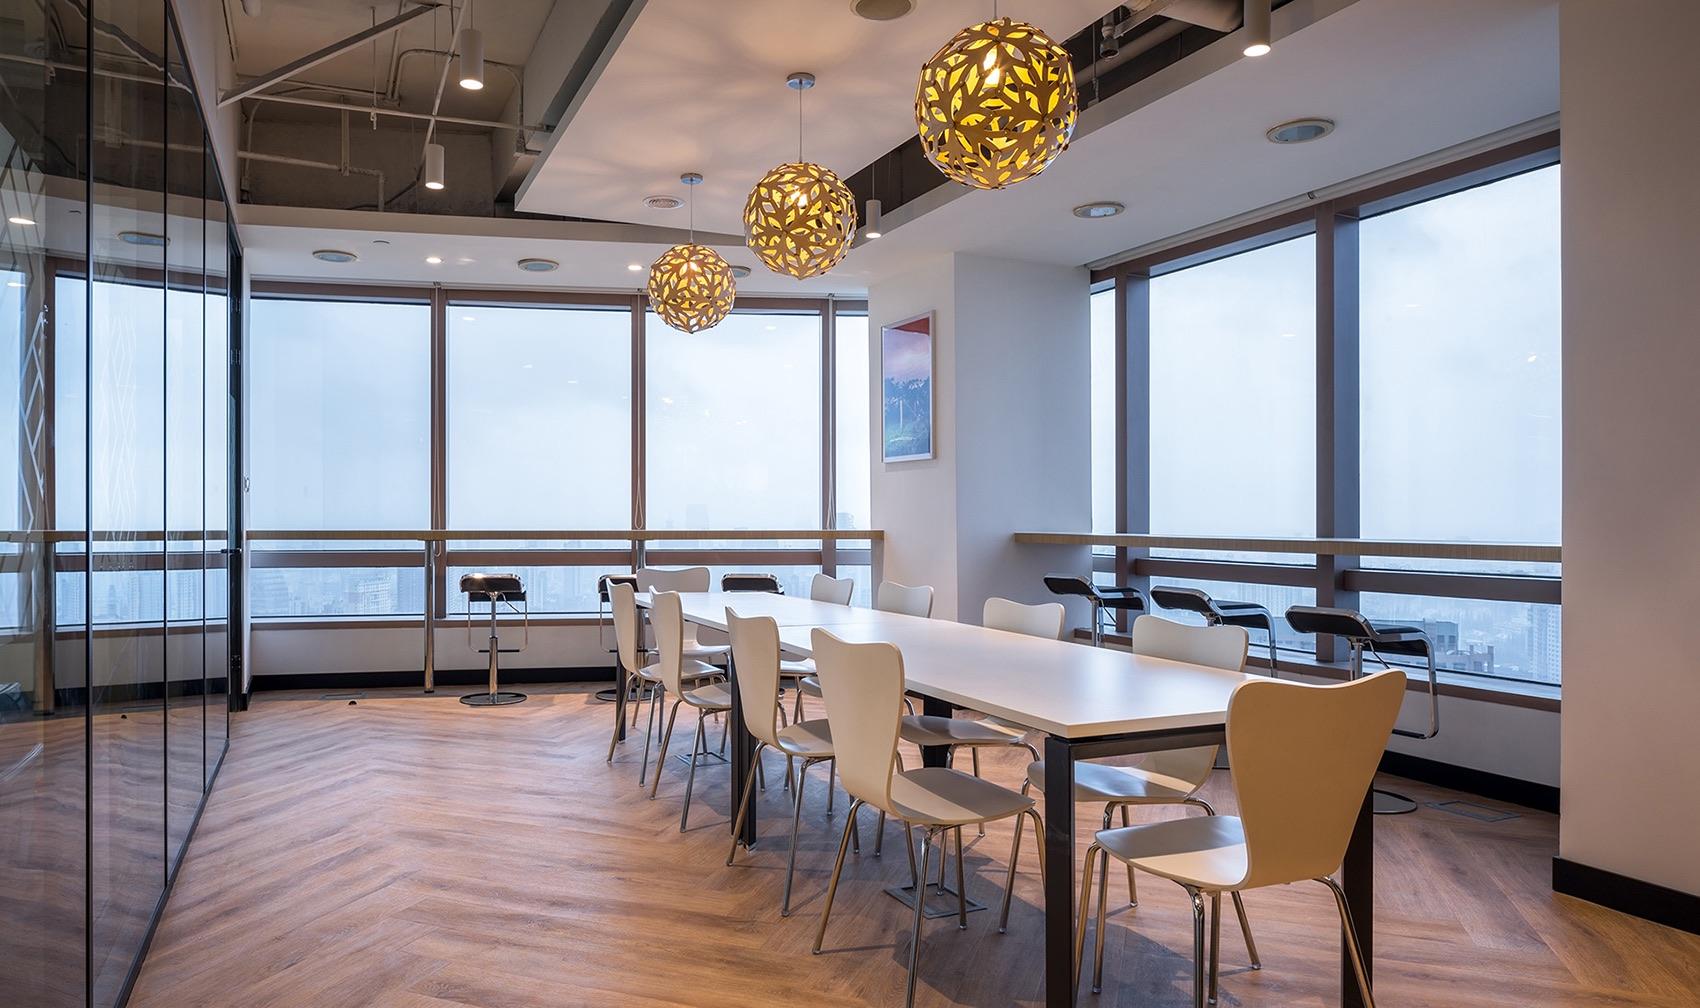 zespri-image-shanghai-office-7